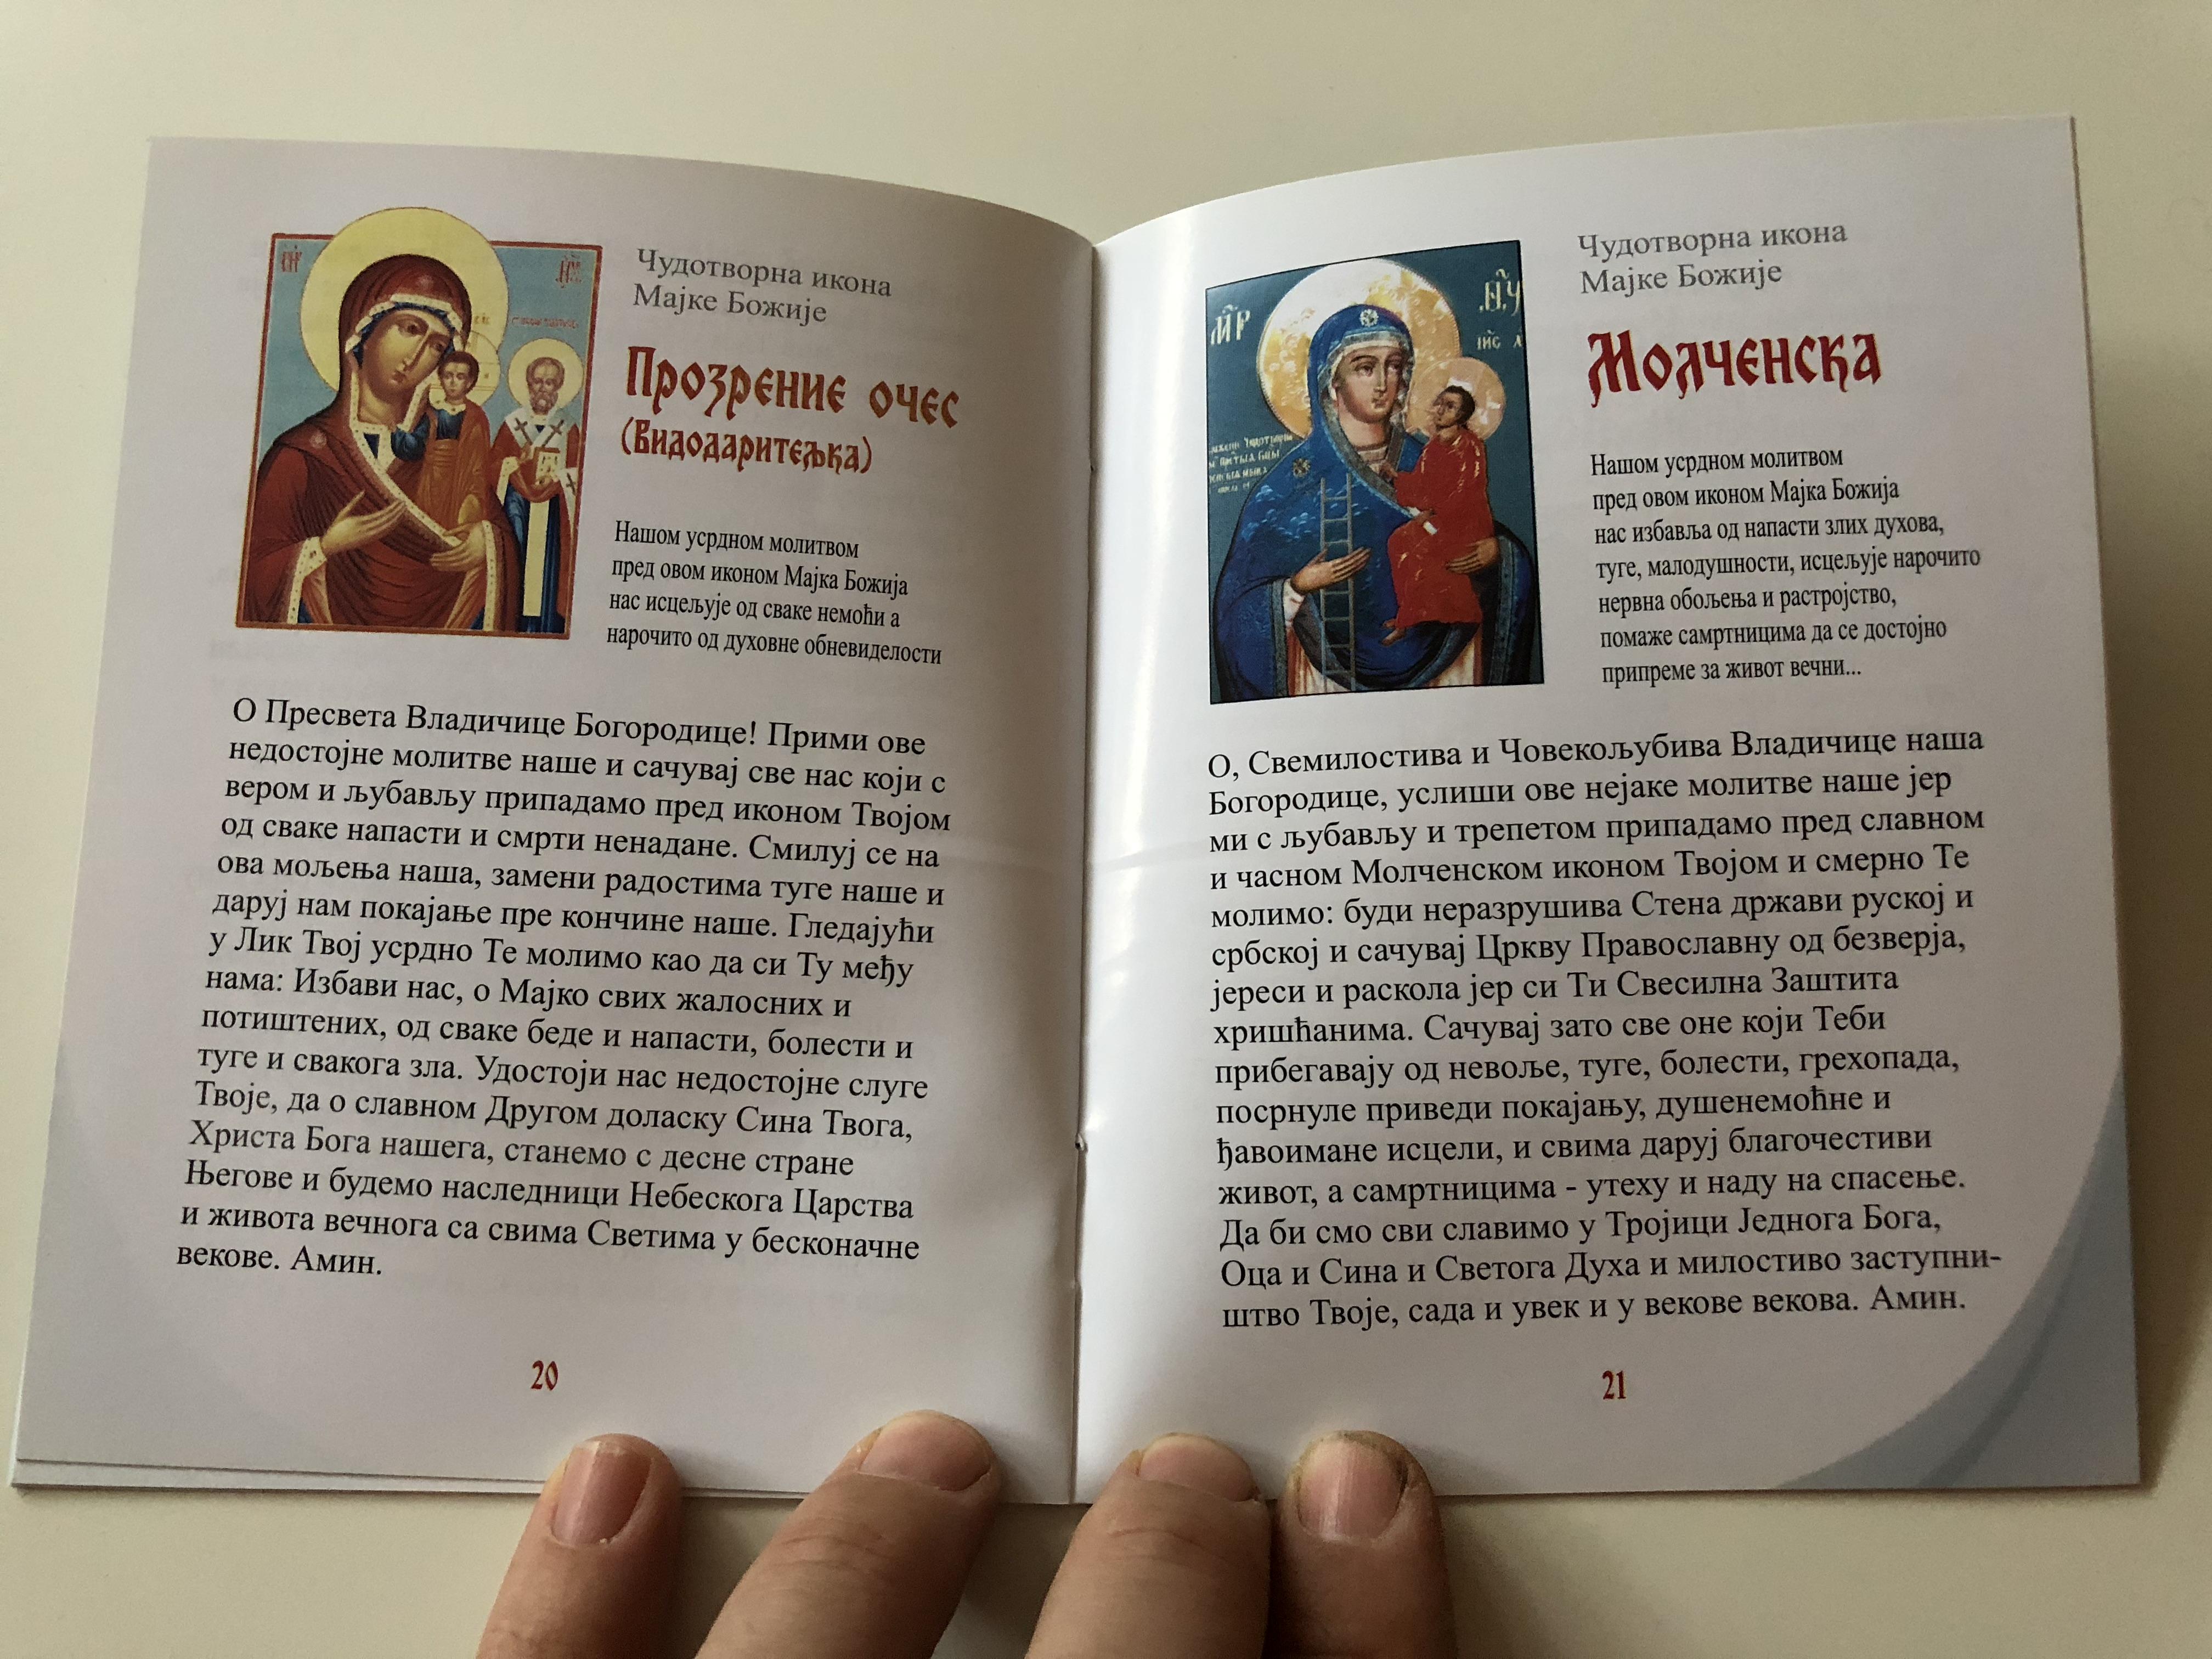 serbian-orthodox-prayer-booklet-blue-4-7-.jpg